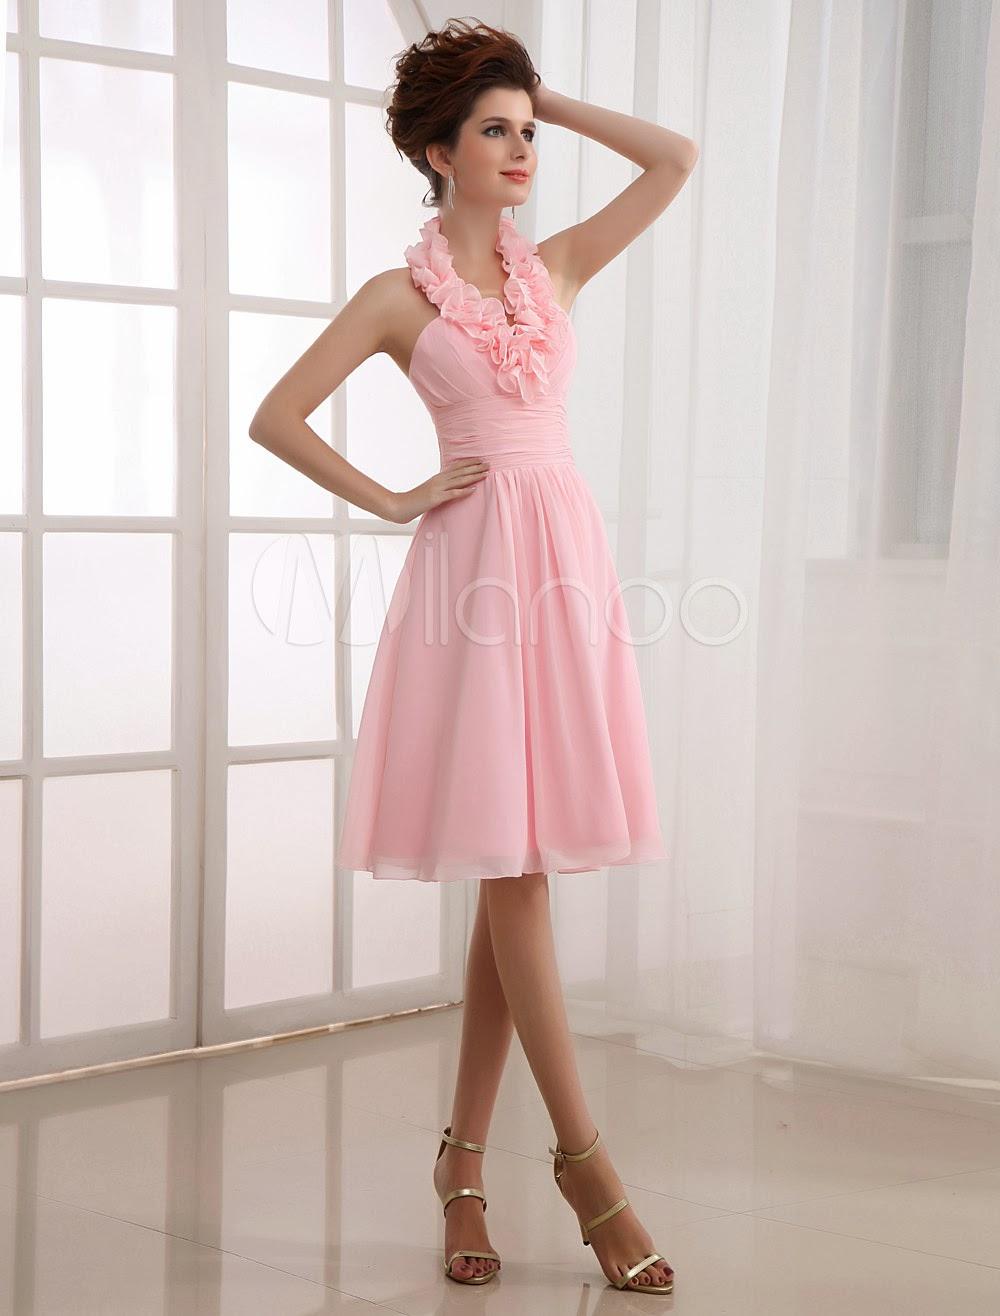 China Wholesale Clothes - Pink Halter Chiffon Knee Length Womens Bridesmaid Dress